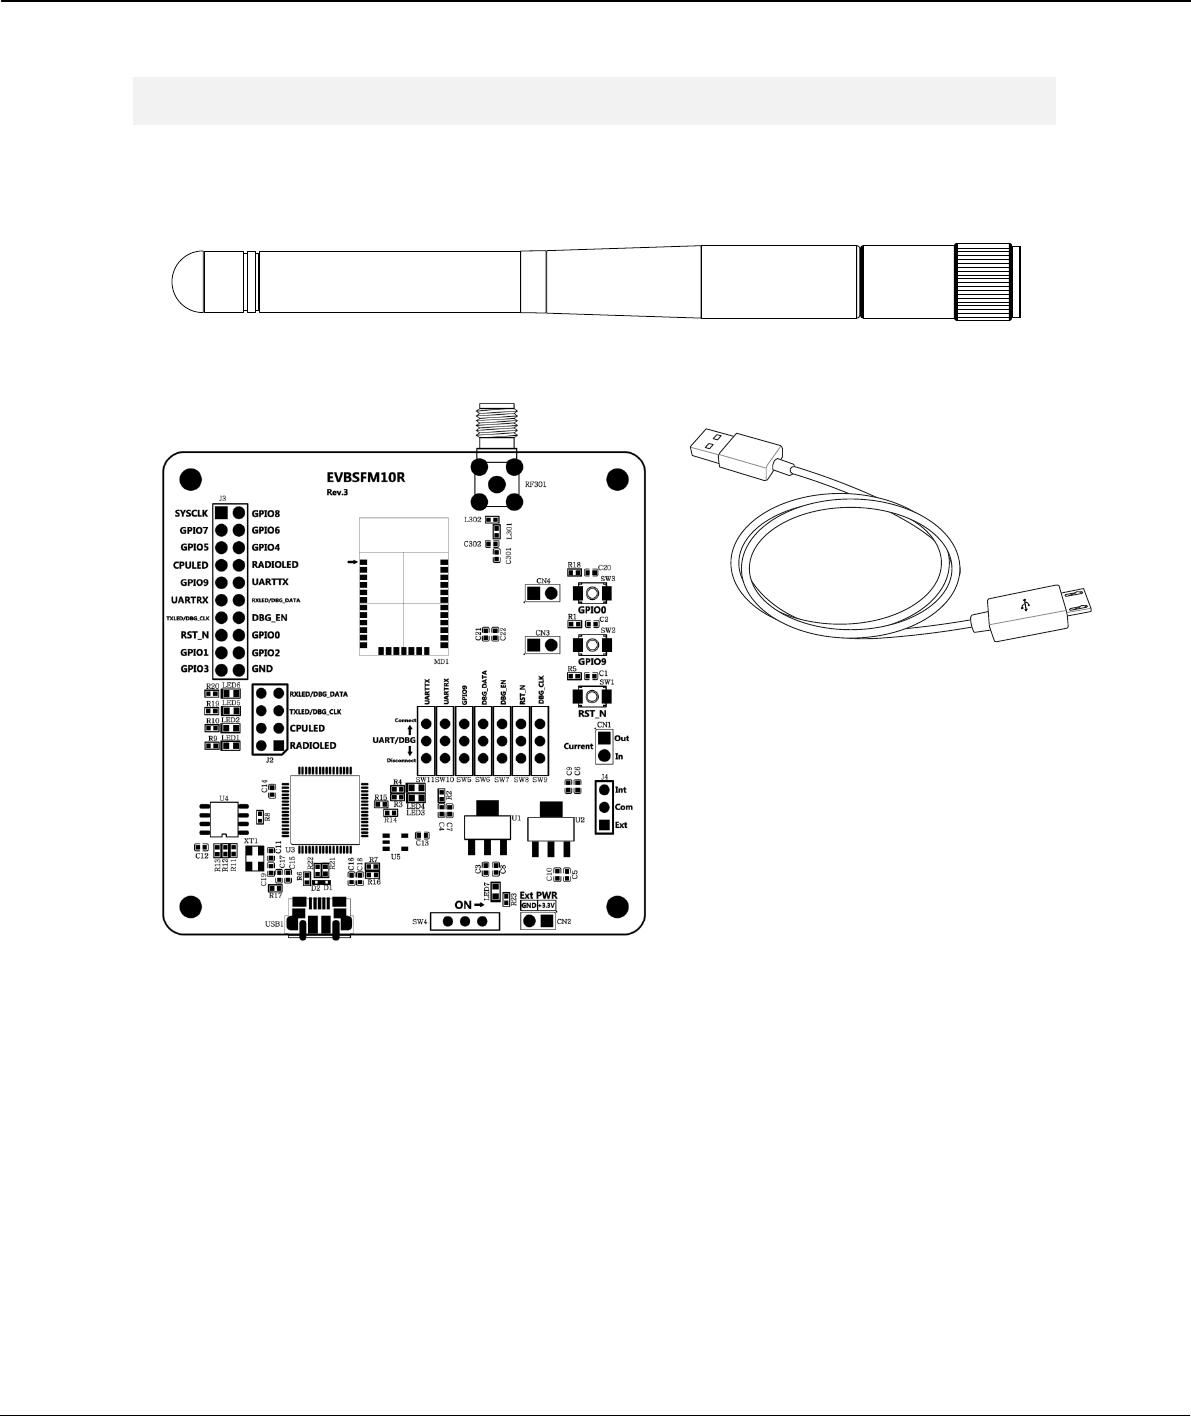 WISOLUser Manual EVBSFM10R Rev.7 170109 58b4a9a454c77 E